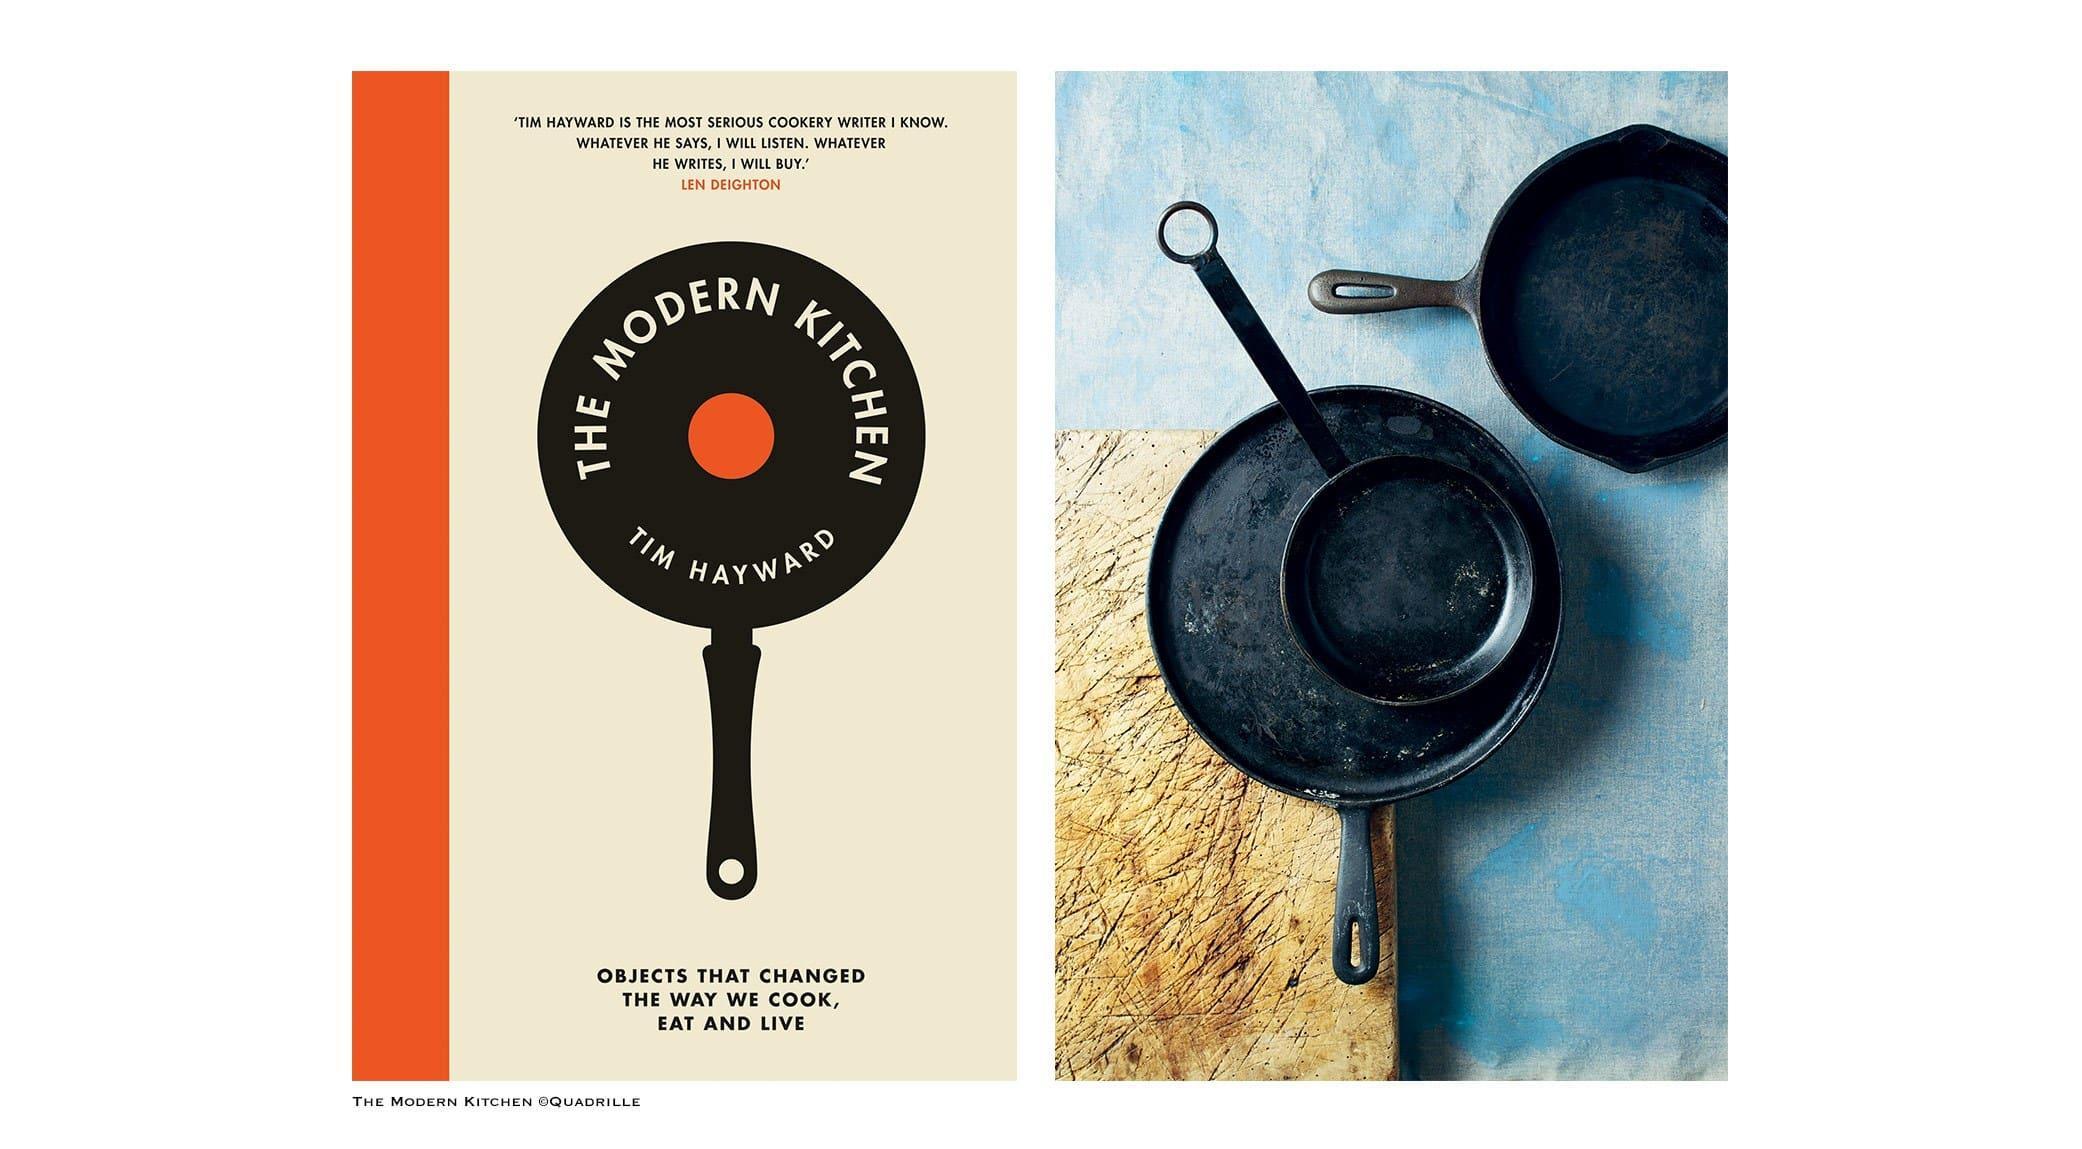 original_08-The-Modern-Kitchen-book-cover-Cast-Iron-Skillet.jpg